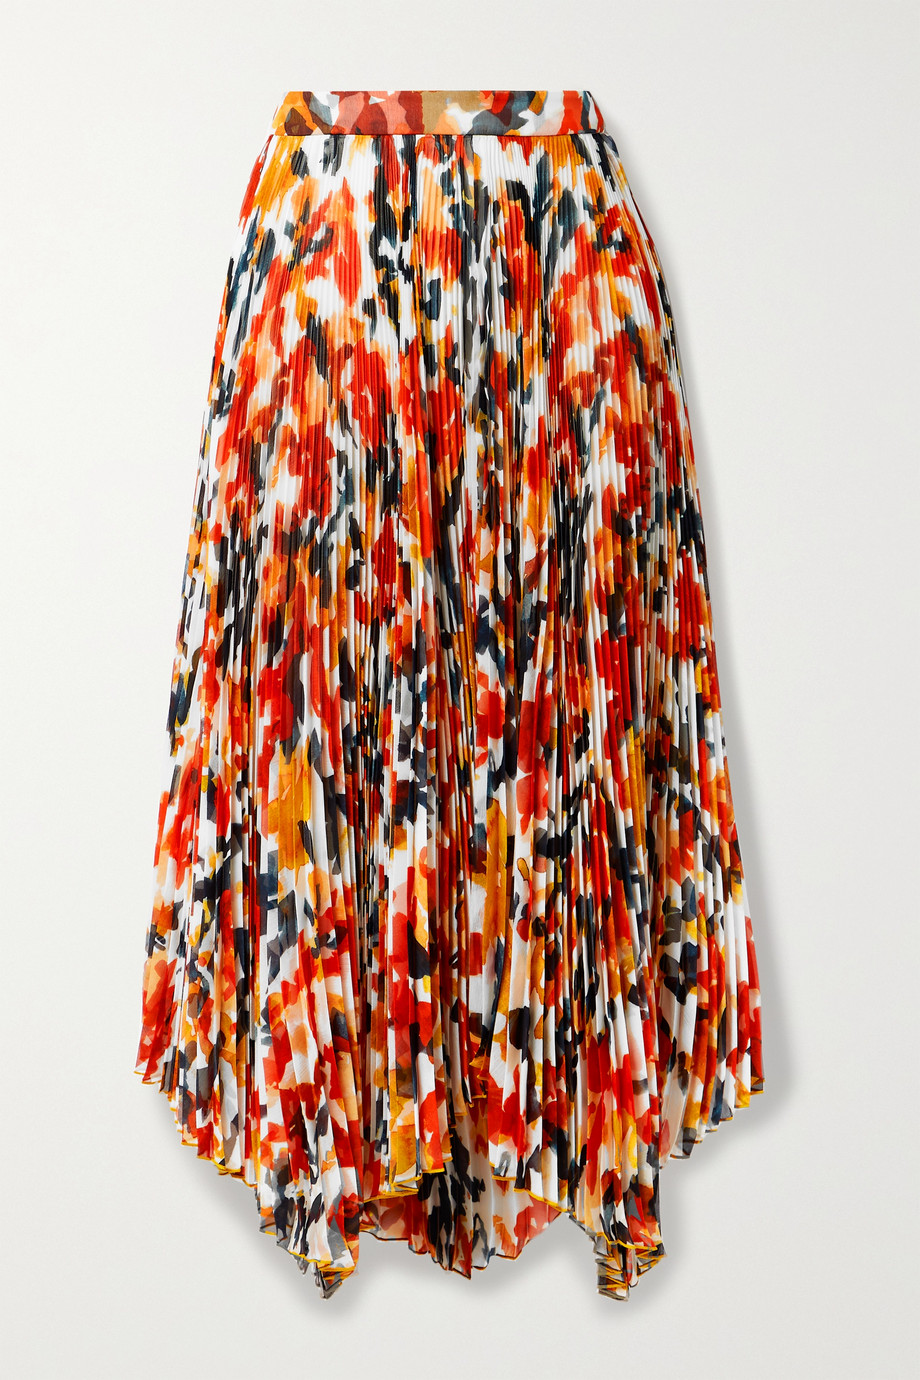 Proenza Schouler Asymmetric pleated floral-print chiffon midi skirt